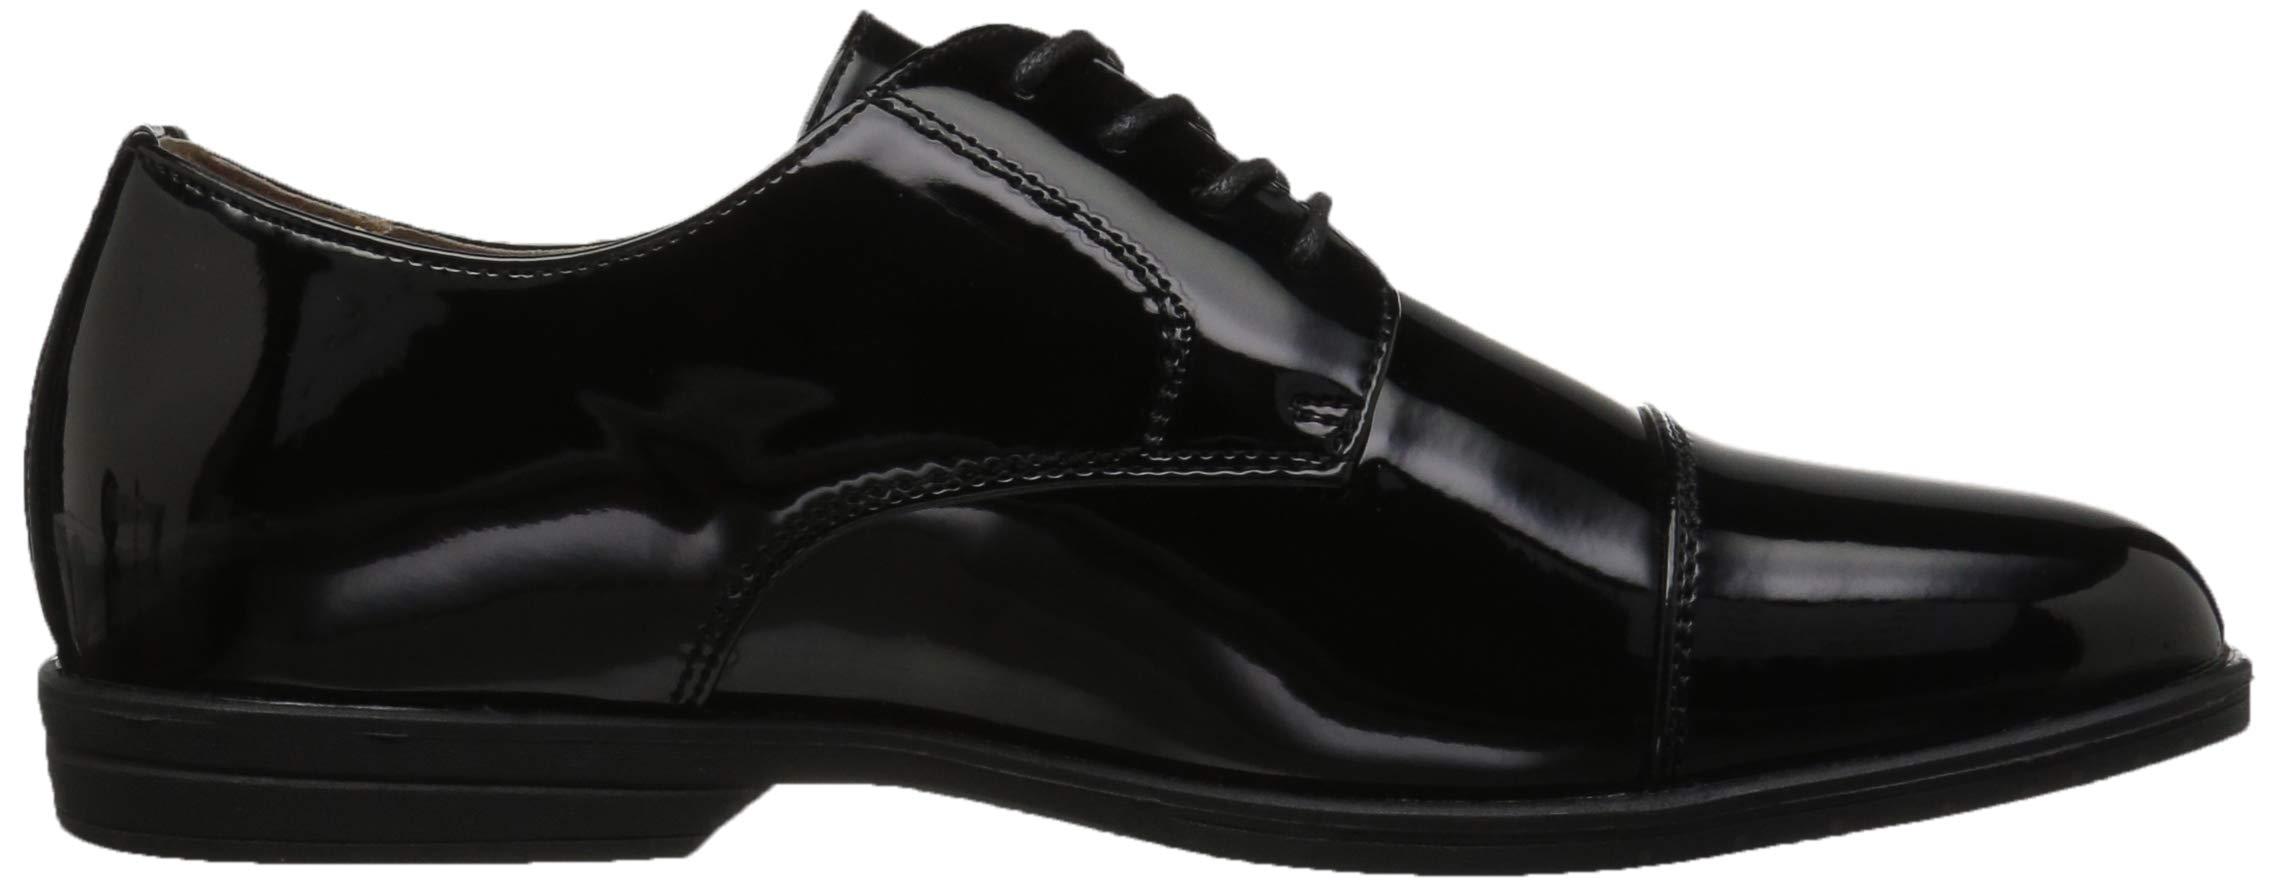 Florsheim Kids Boys' Reveal Tuxedo Formal Cap Toe Oxford Jr, Black Patent, 1.5 Medium Little Kid by Florsheim (Image #7)